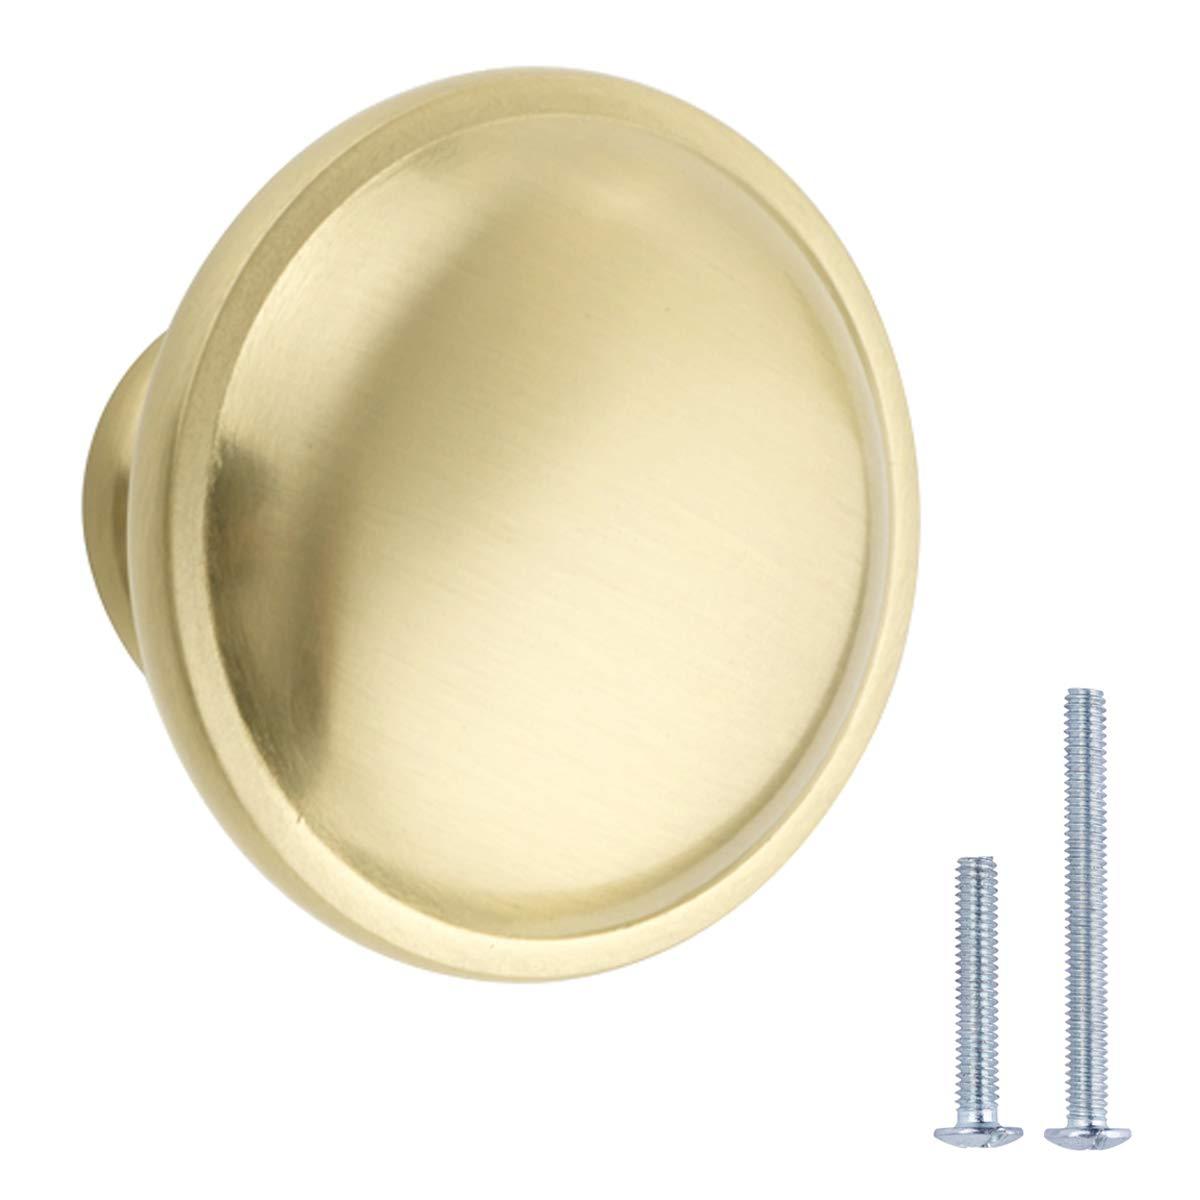 AmazonBasics Mushroom Cabinet Knob, 1.19'' Diameter, Golden Champagne, 25-Pack